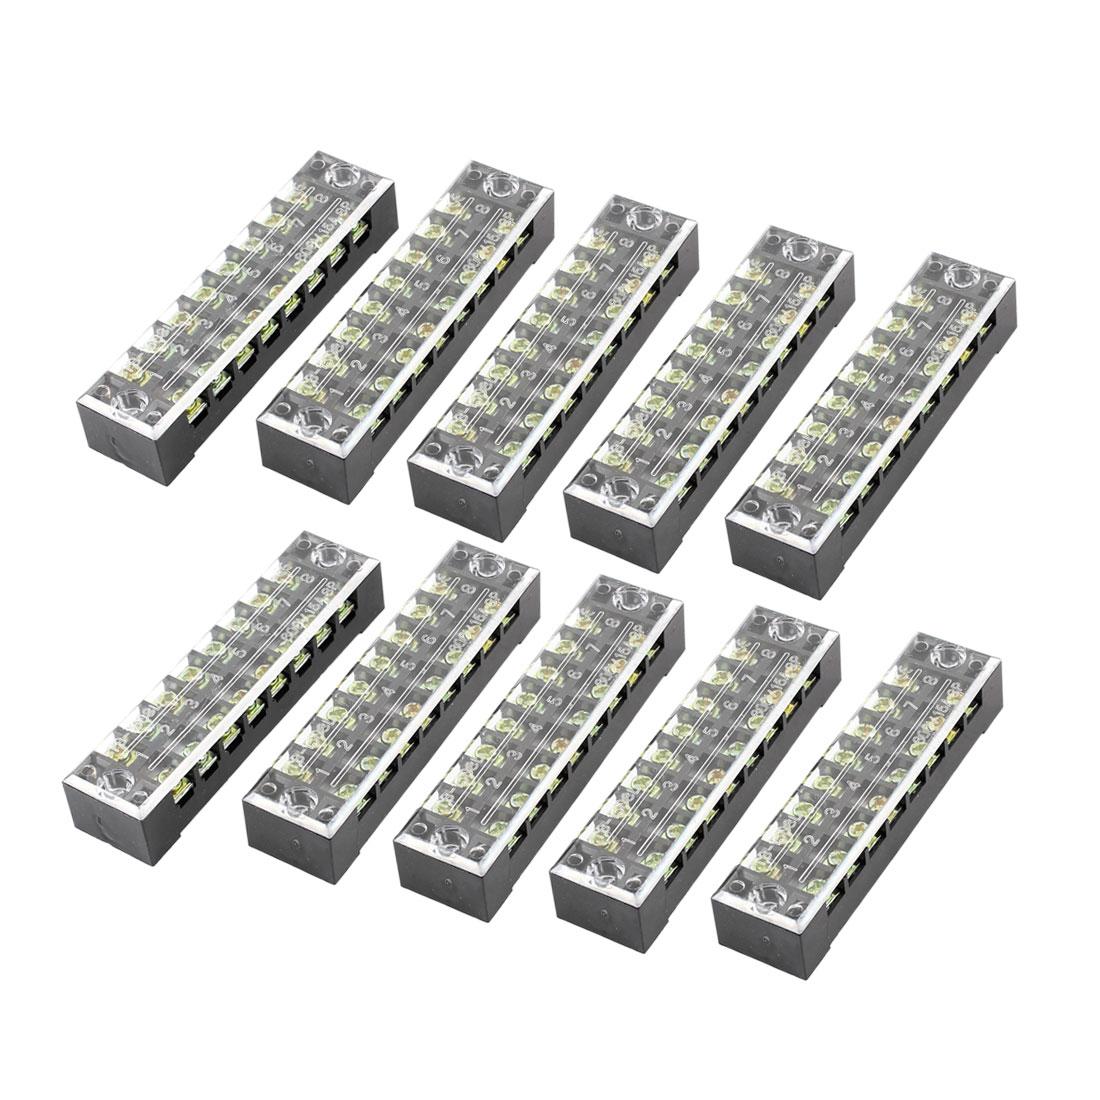 10 Pcs Dual Row 8 Position Screw Barrier Terminal Block Strip 600V 15A